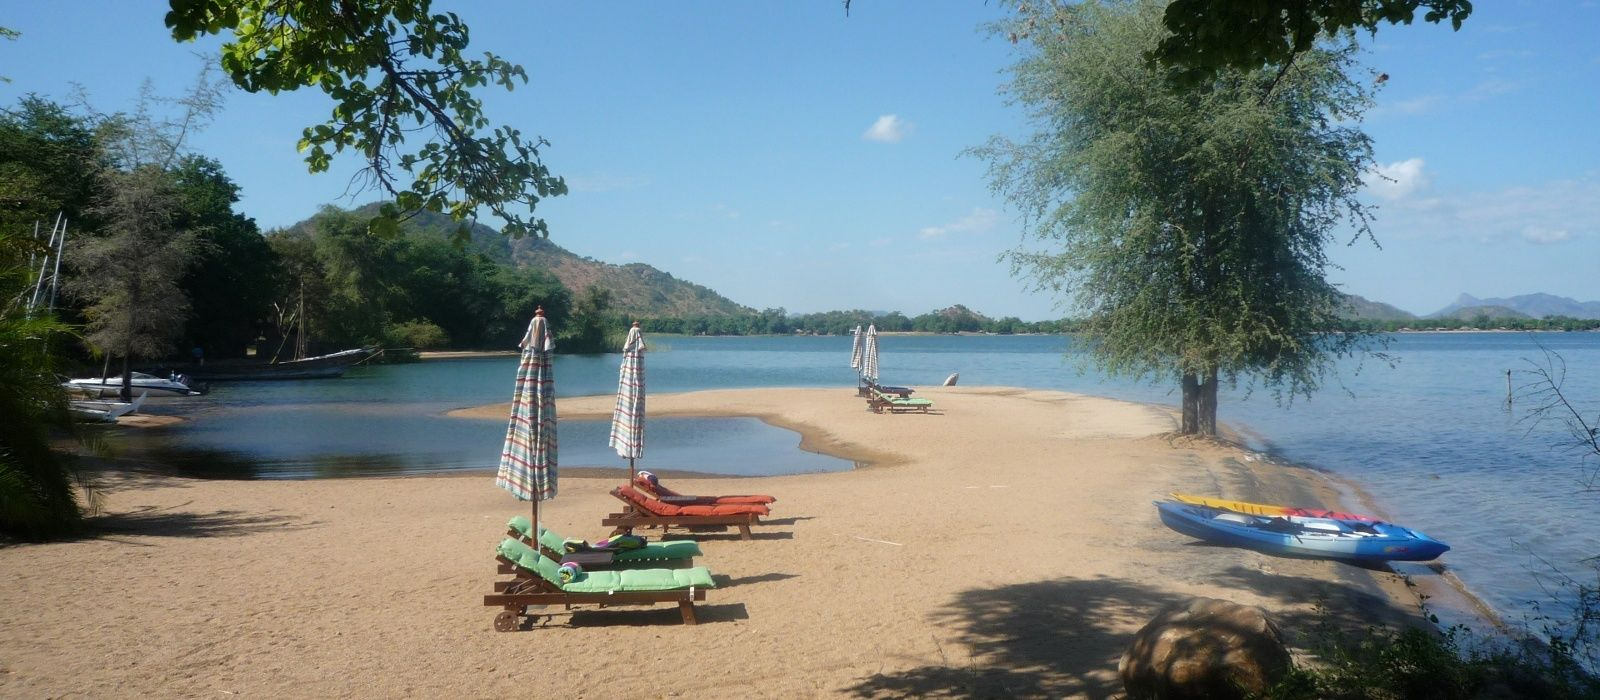 Destination Cape Mc Clear Malawi